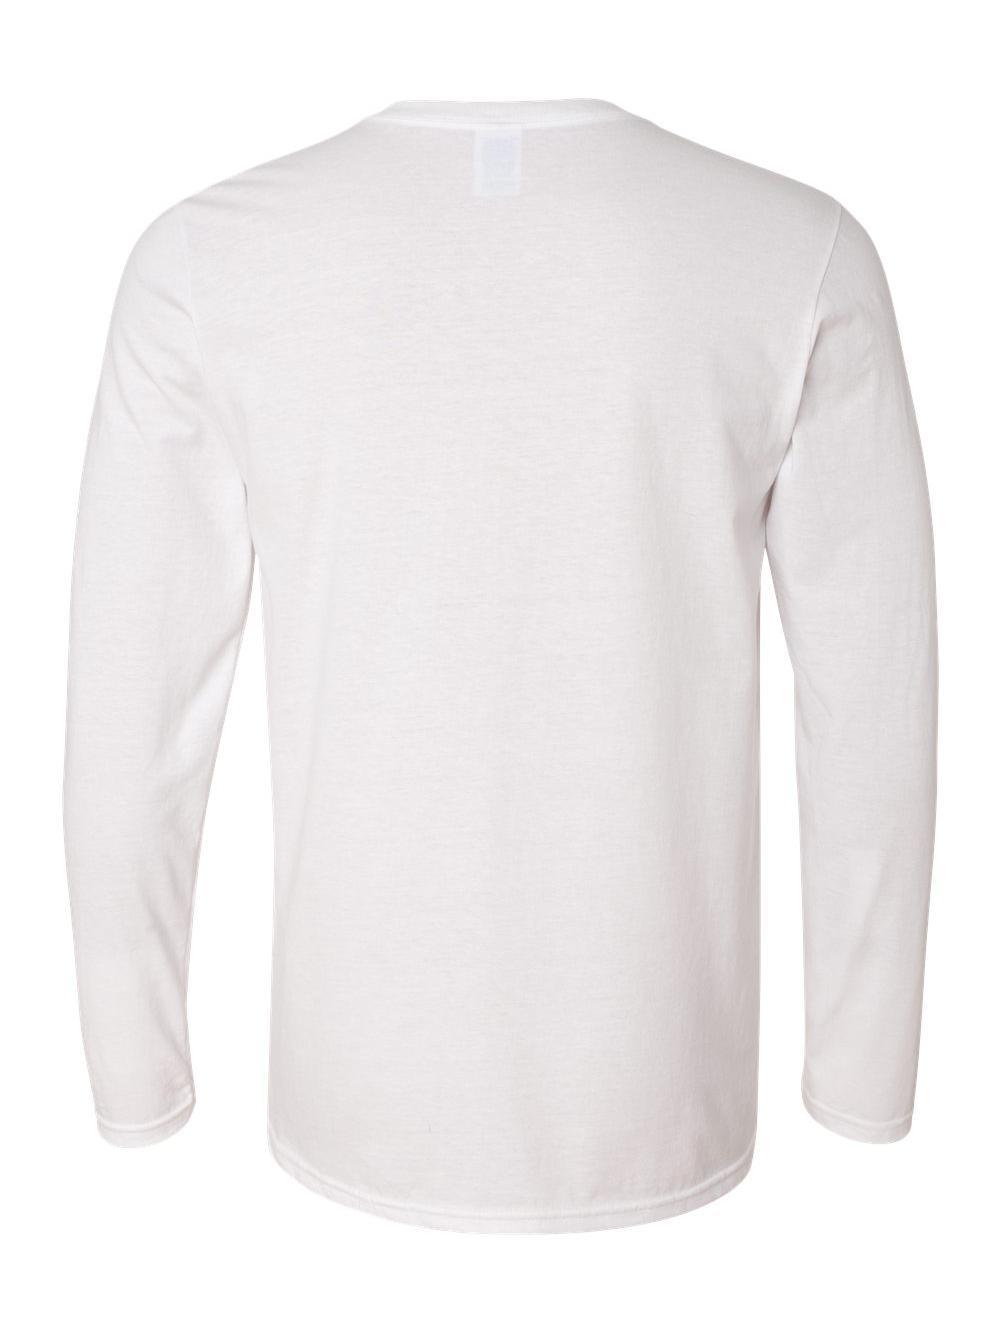 Gildan-Softstyle-Long-Sleeve-T-Shirt-64400 thumbnail 22